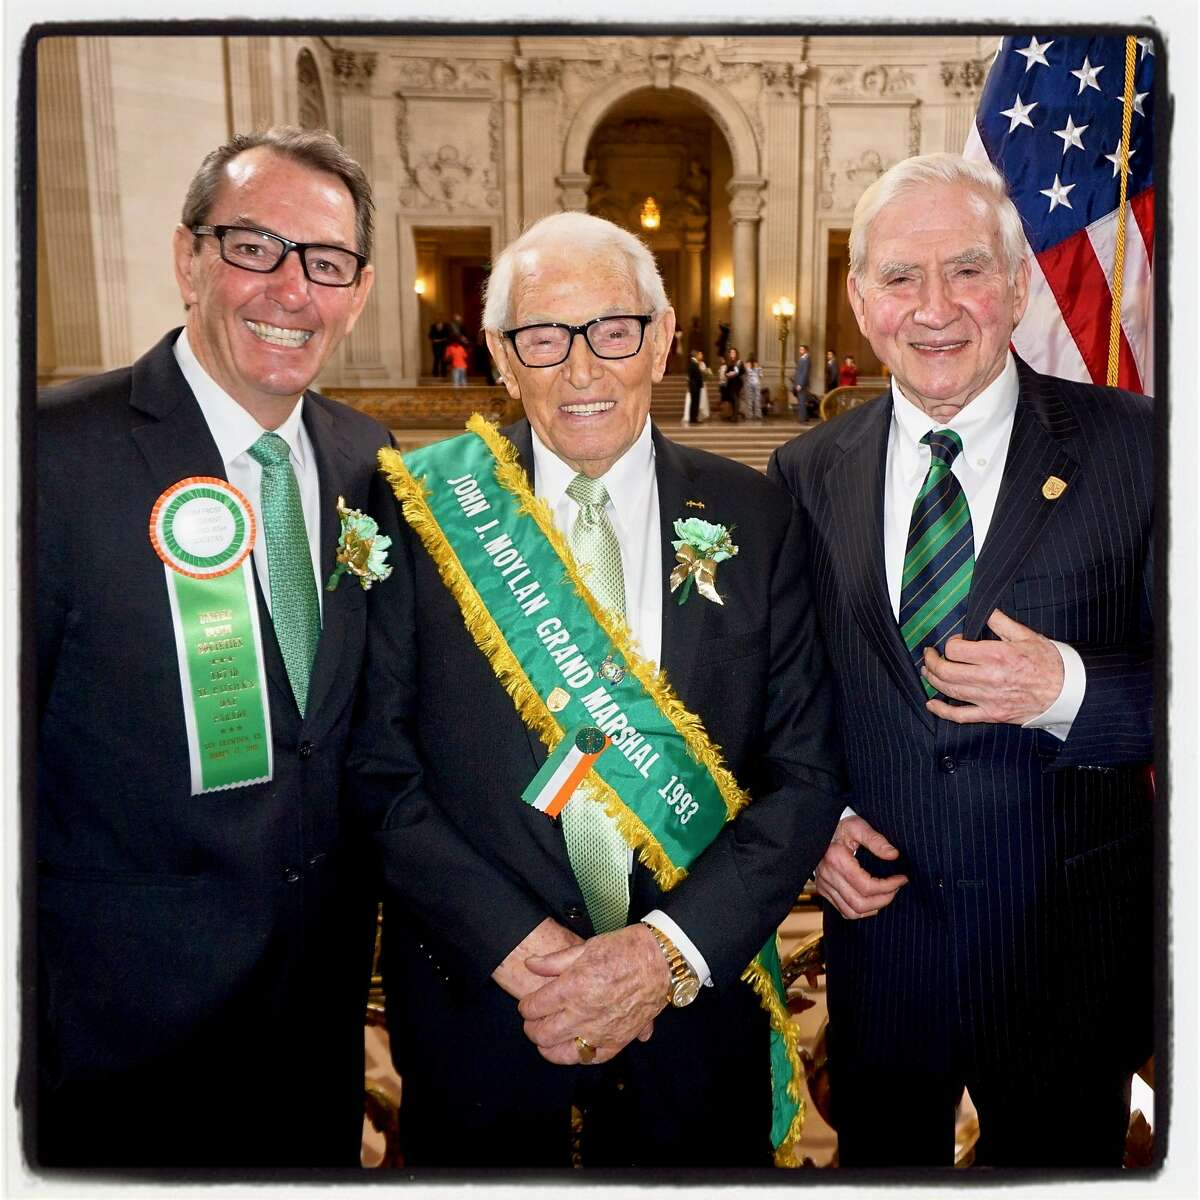 United Irish Societies President Liam Frost (left) with John Moylan and SF-Cork Sister City cofounder Diarmuid Philpott. March 9, 2018.